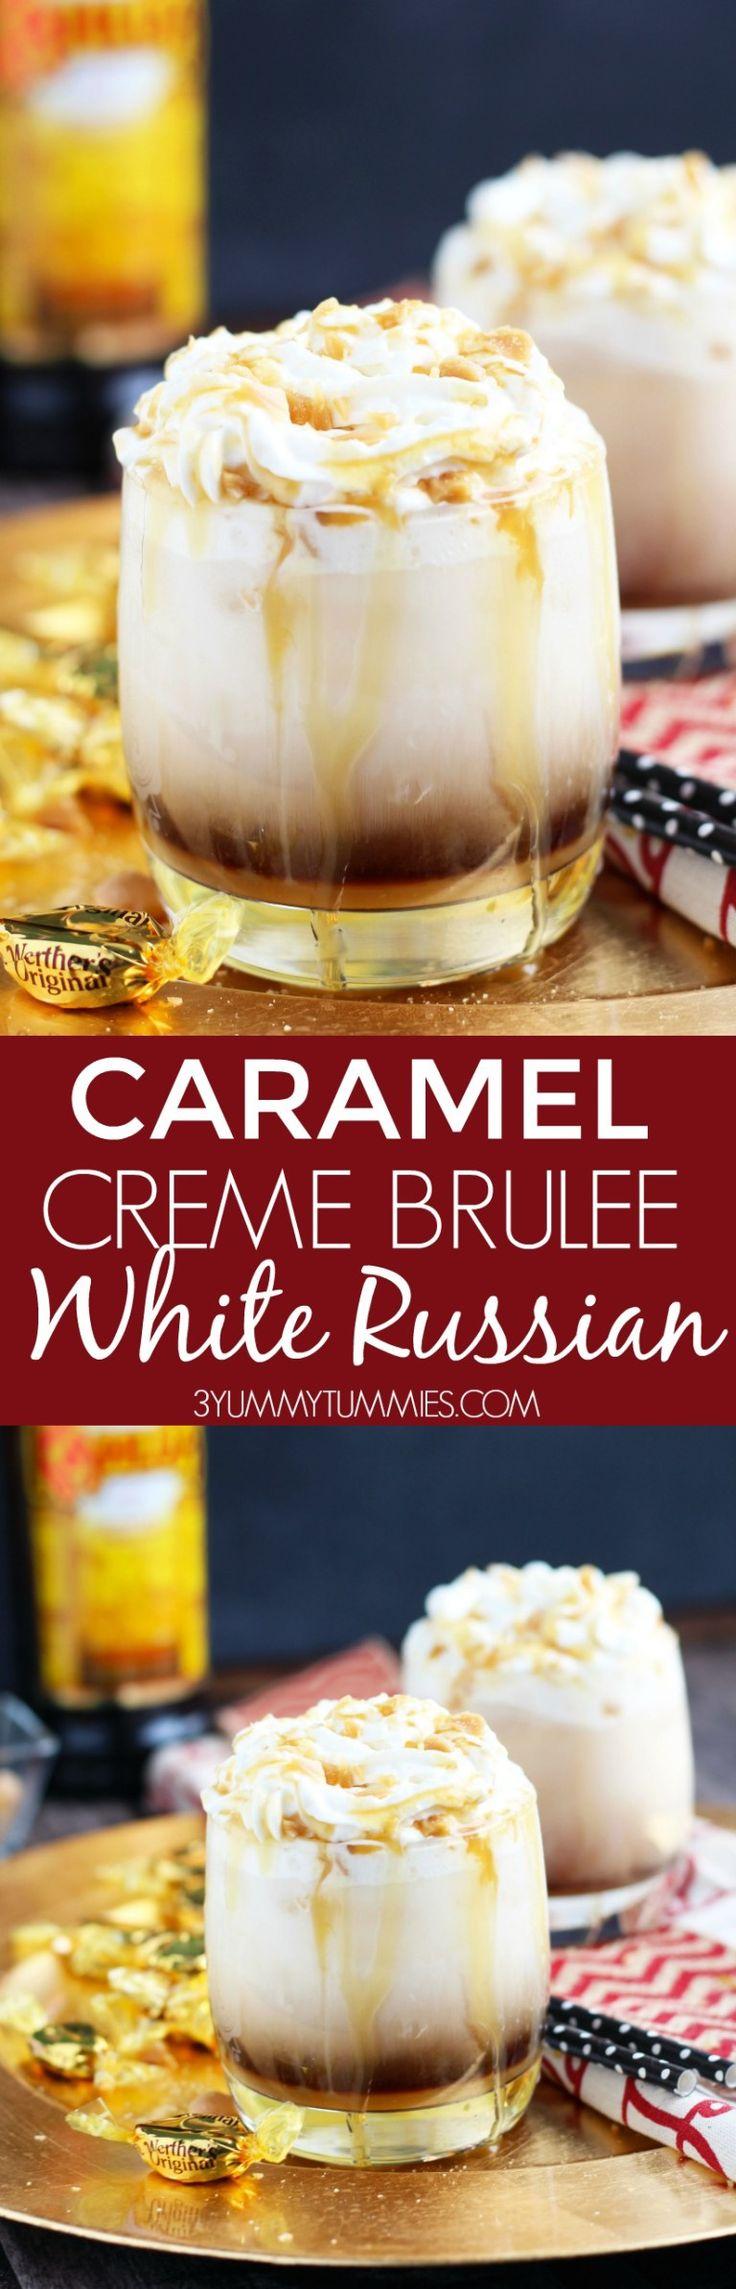 caramel-creme-brulee-white-russian